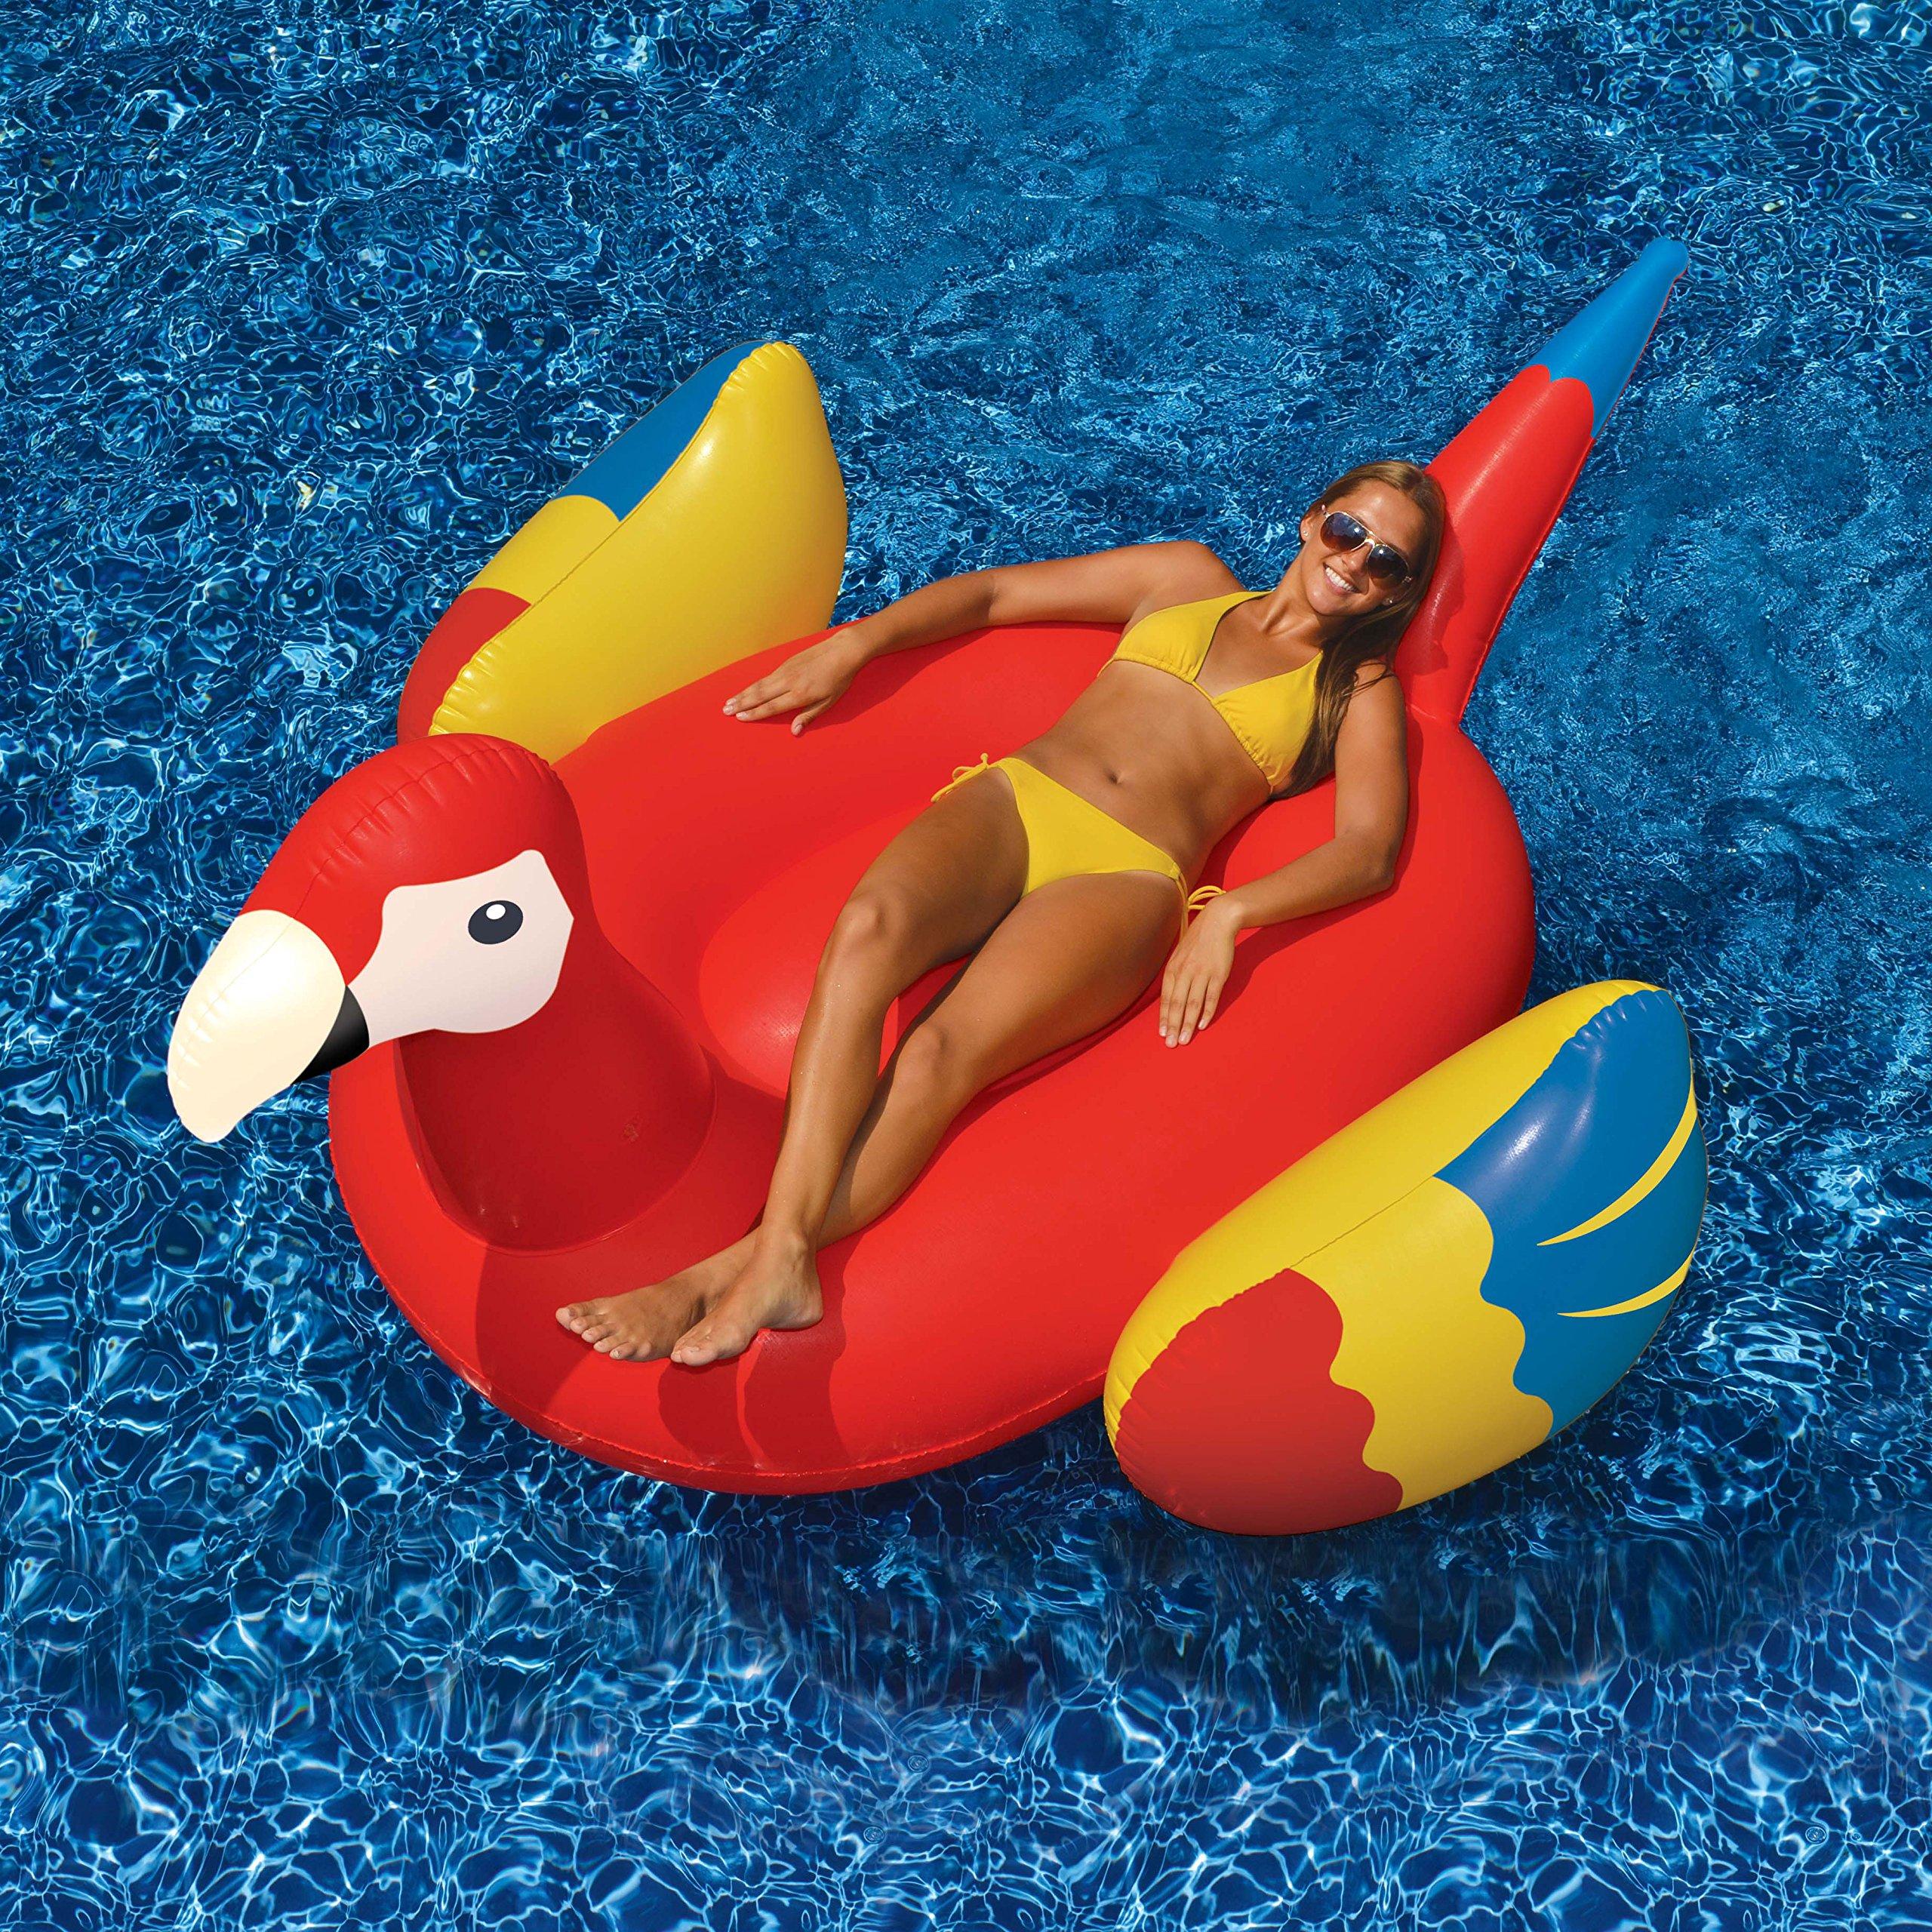 Swimline Giant White Swan/Flamingo/Black Swan/Parrot Floats for Swimming Pools (4 Pack)